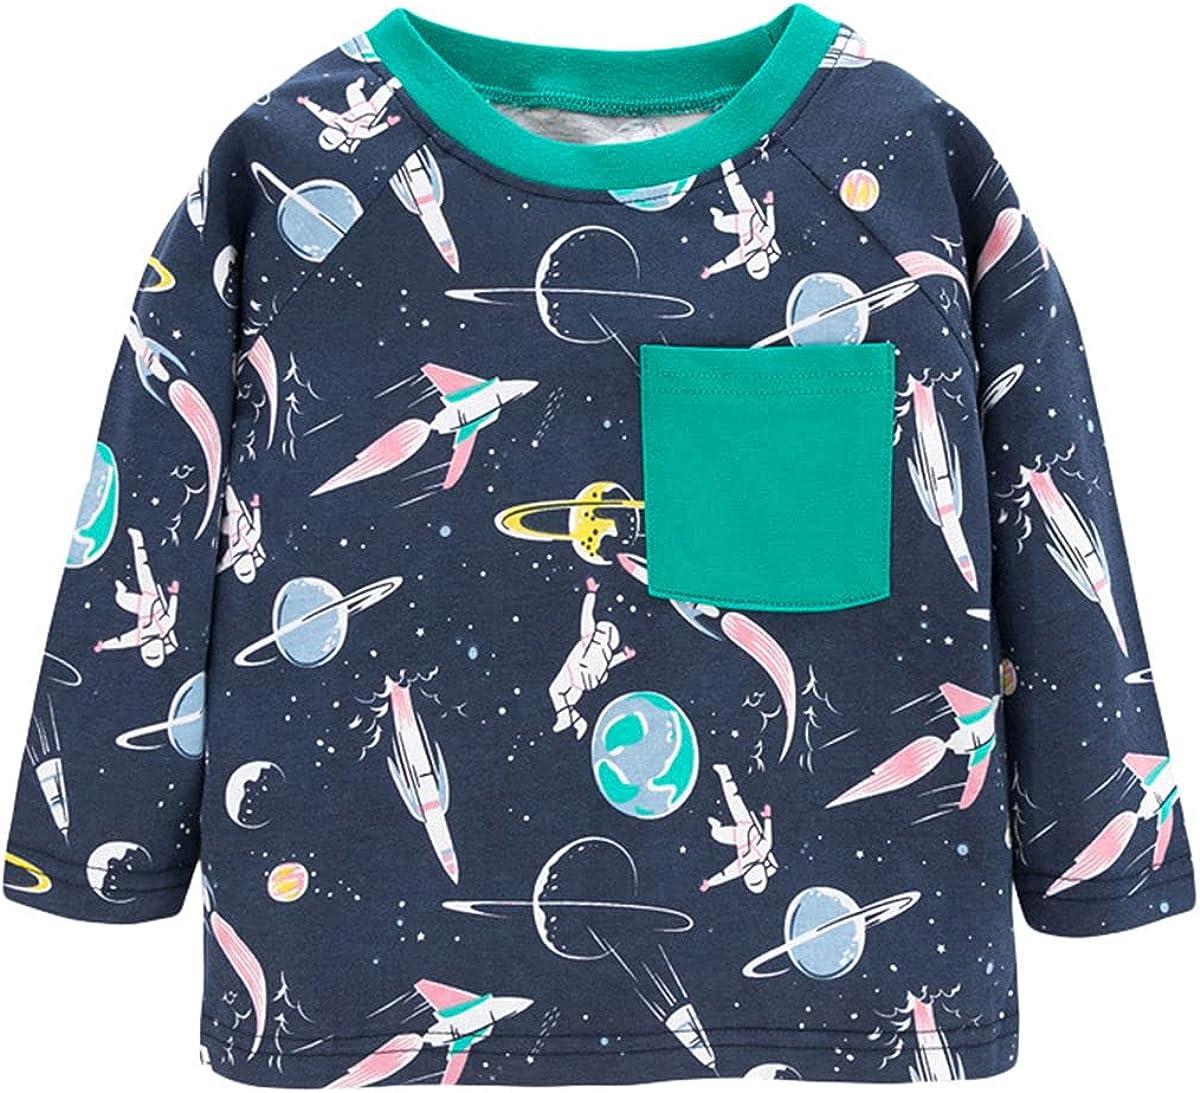 Boy's Long-Sleeve Pullover Sweater Cartoon Graphic Playwear 100% Cotton 2-7T